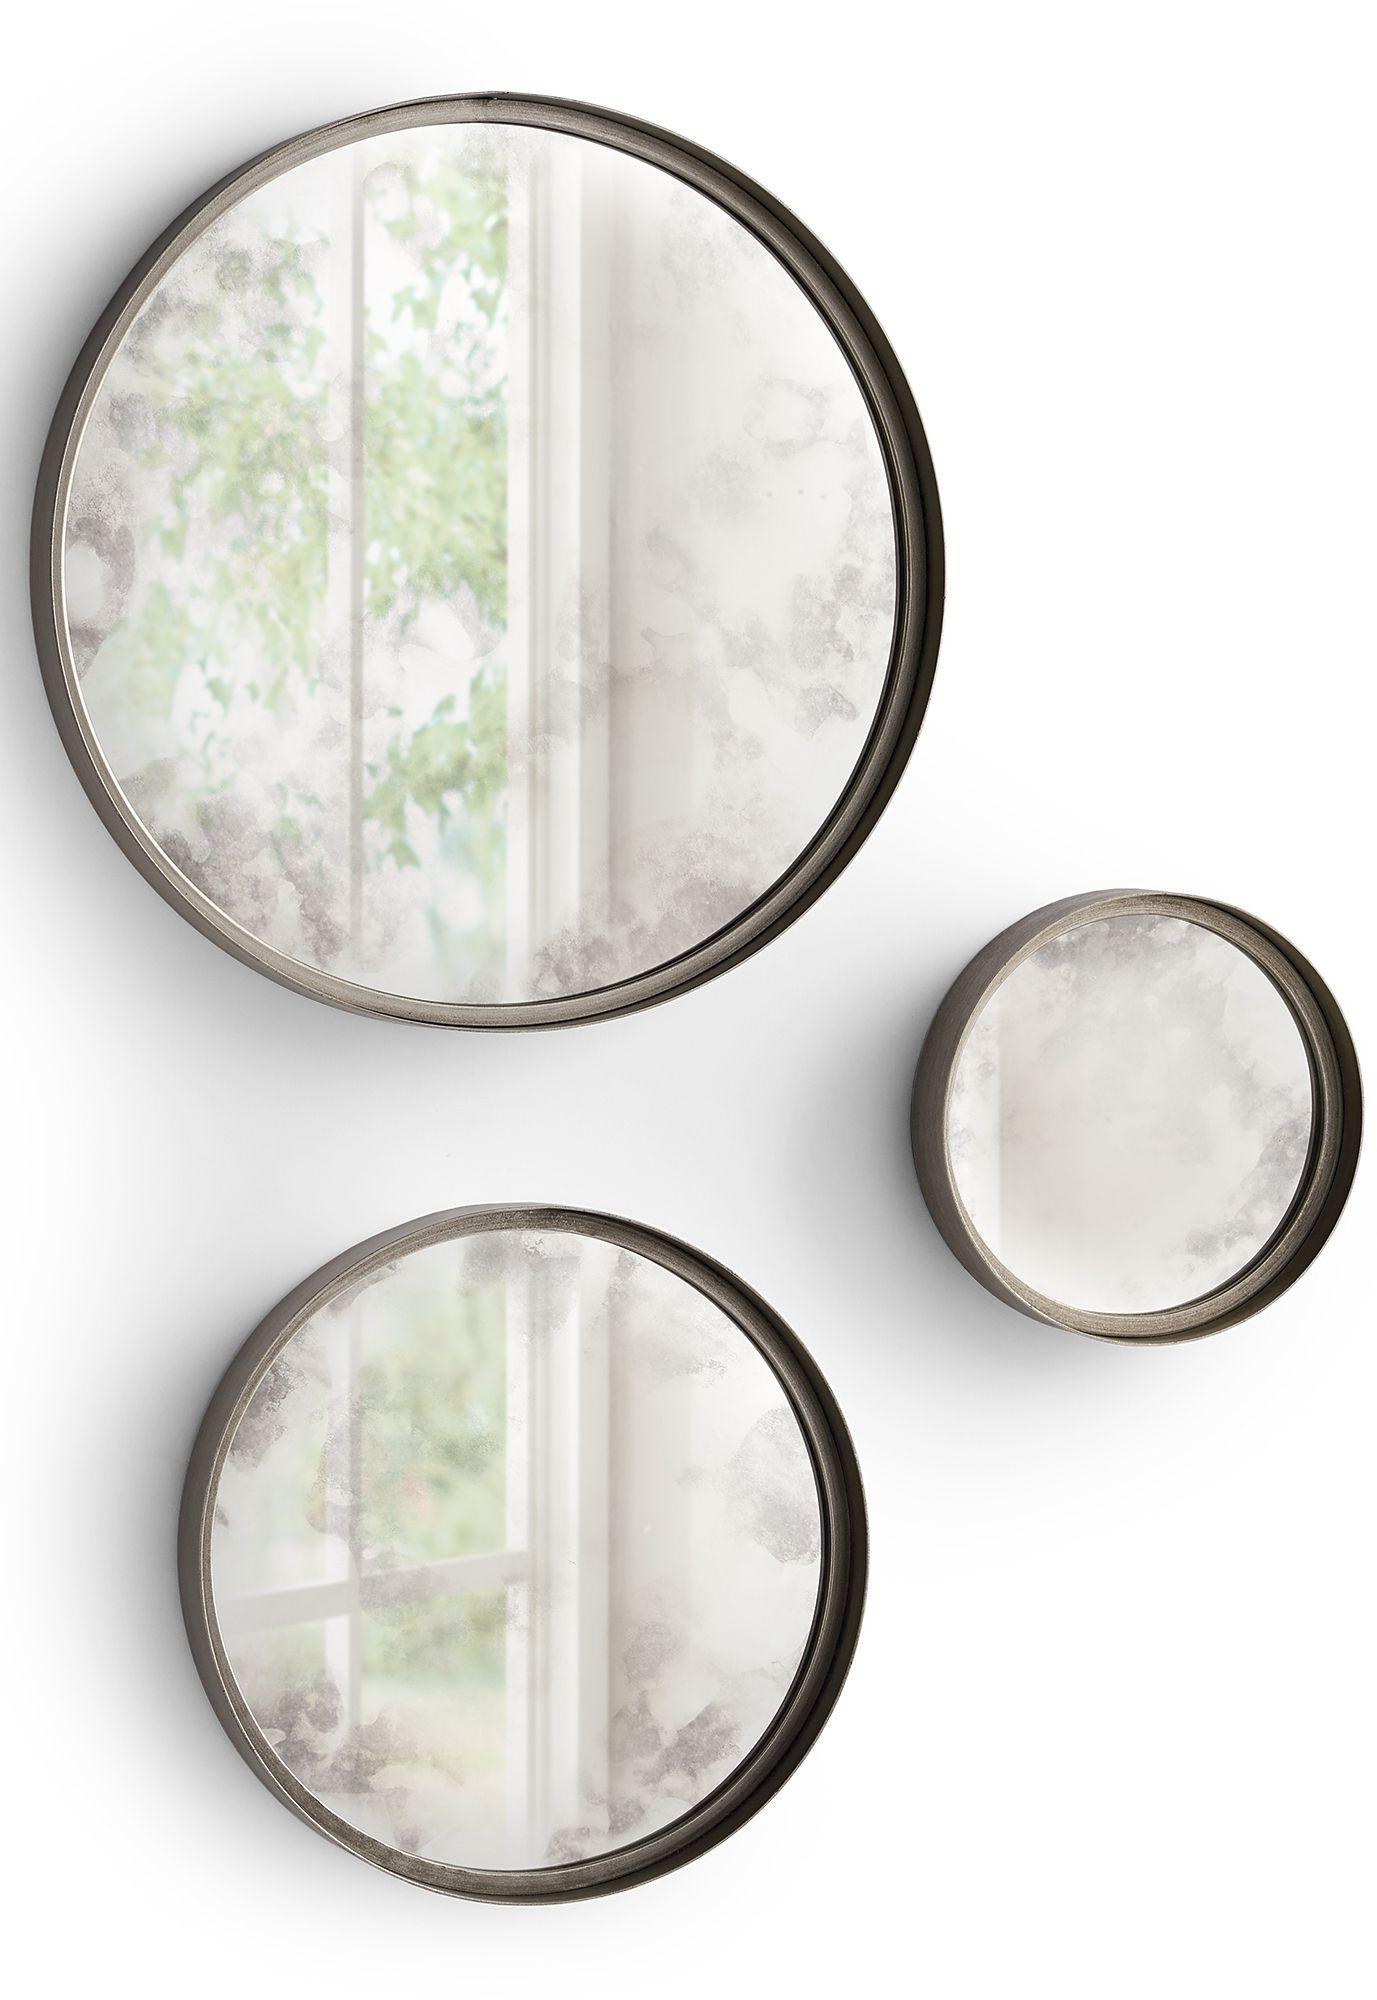 Shire Wall Mirror Set Of Three Grandin Road Mirror Mirror Wall Gallery Wall Hanging